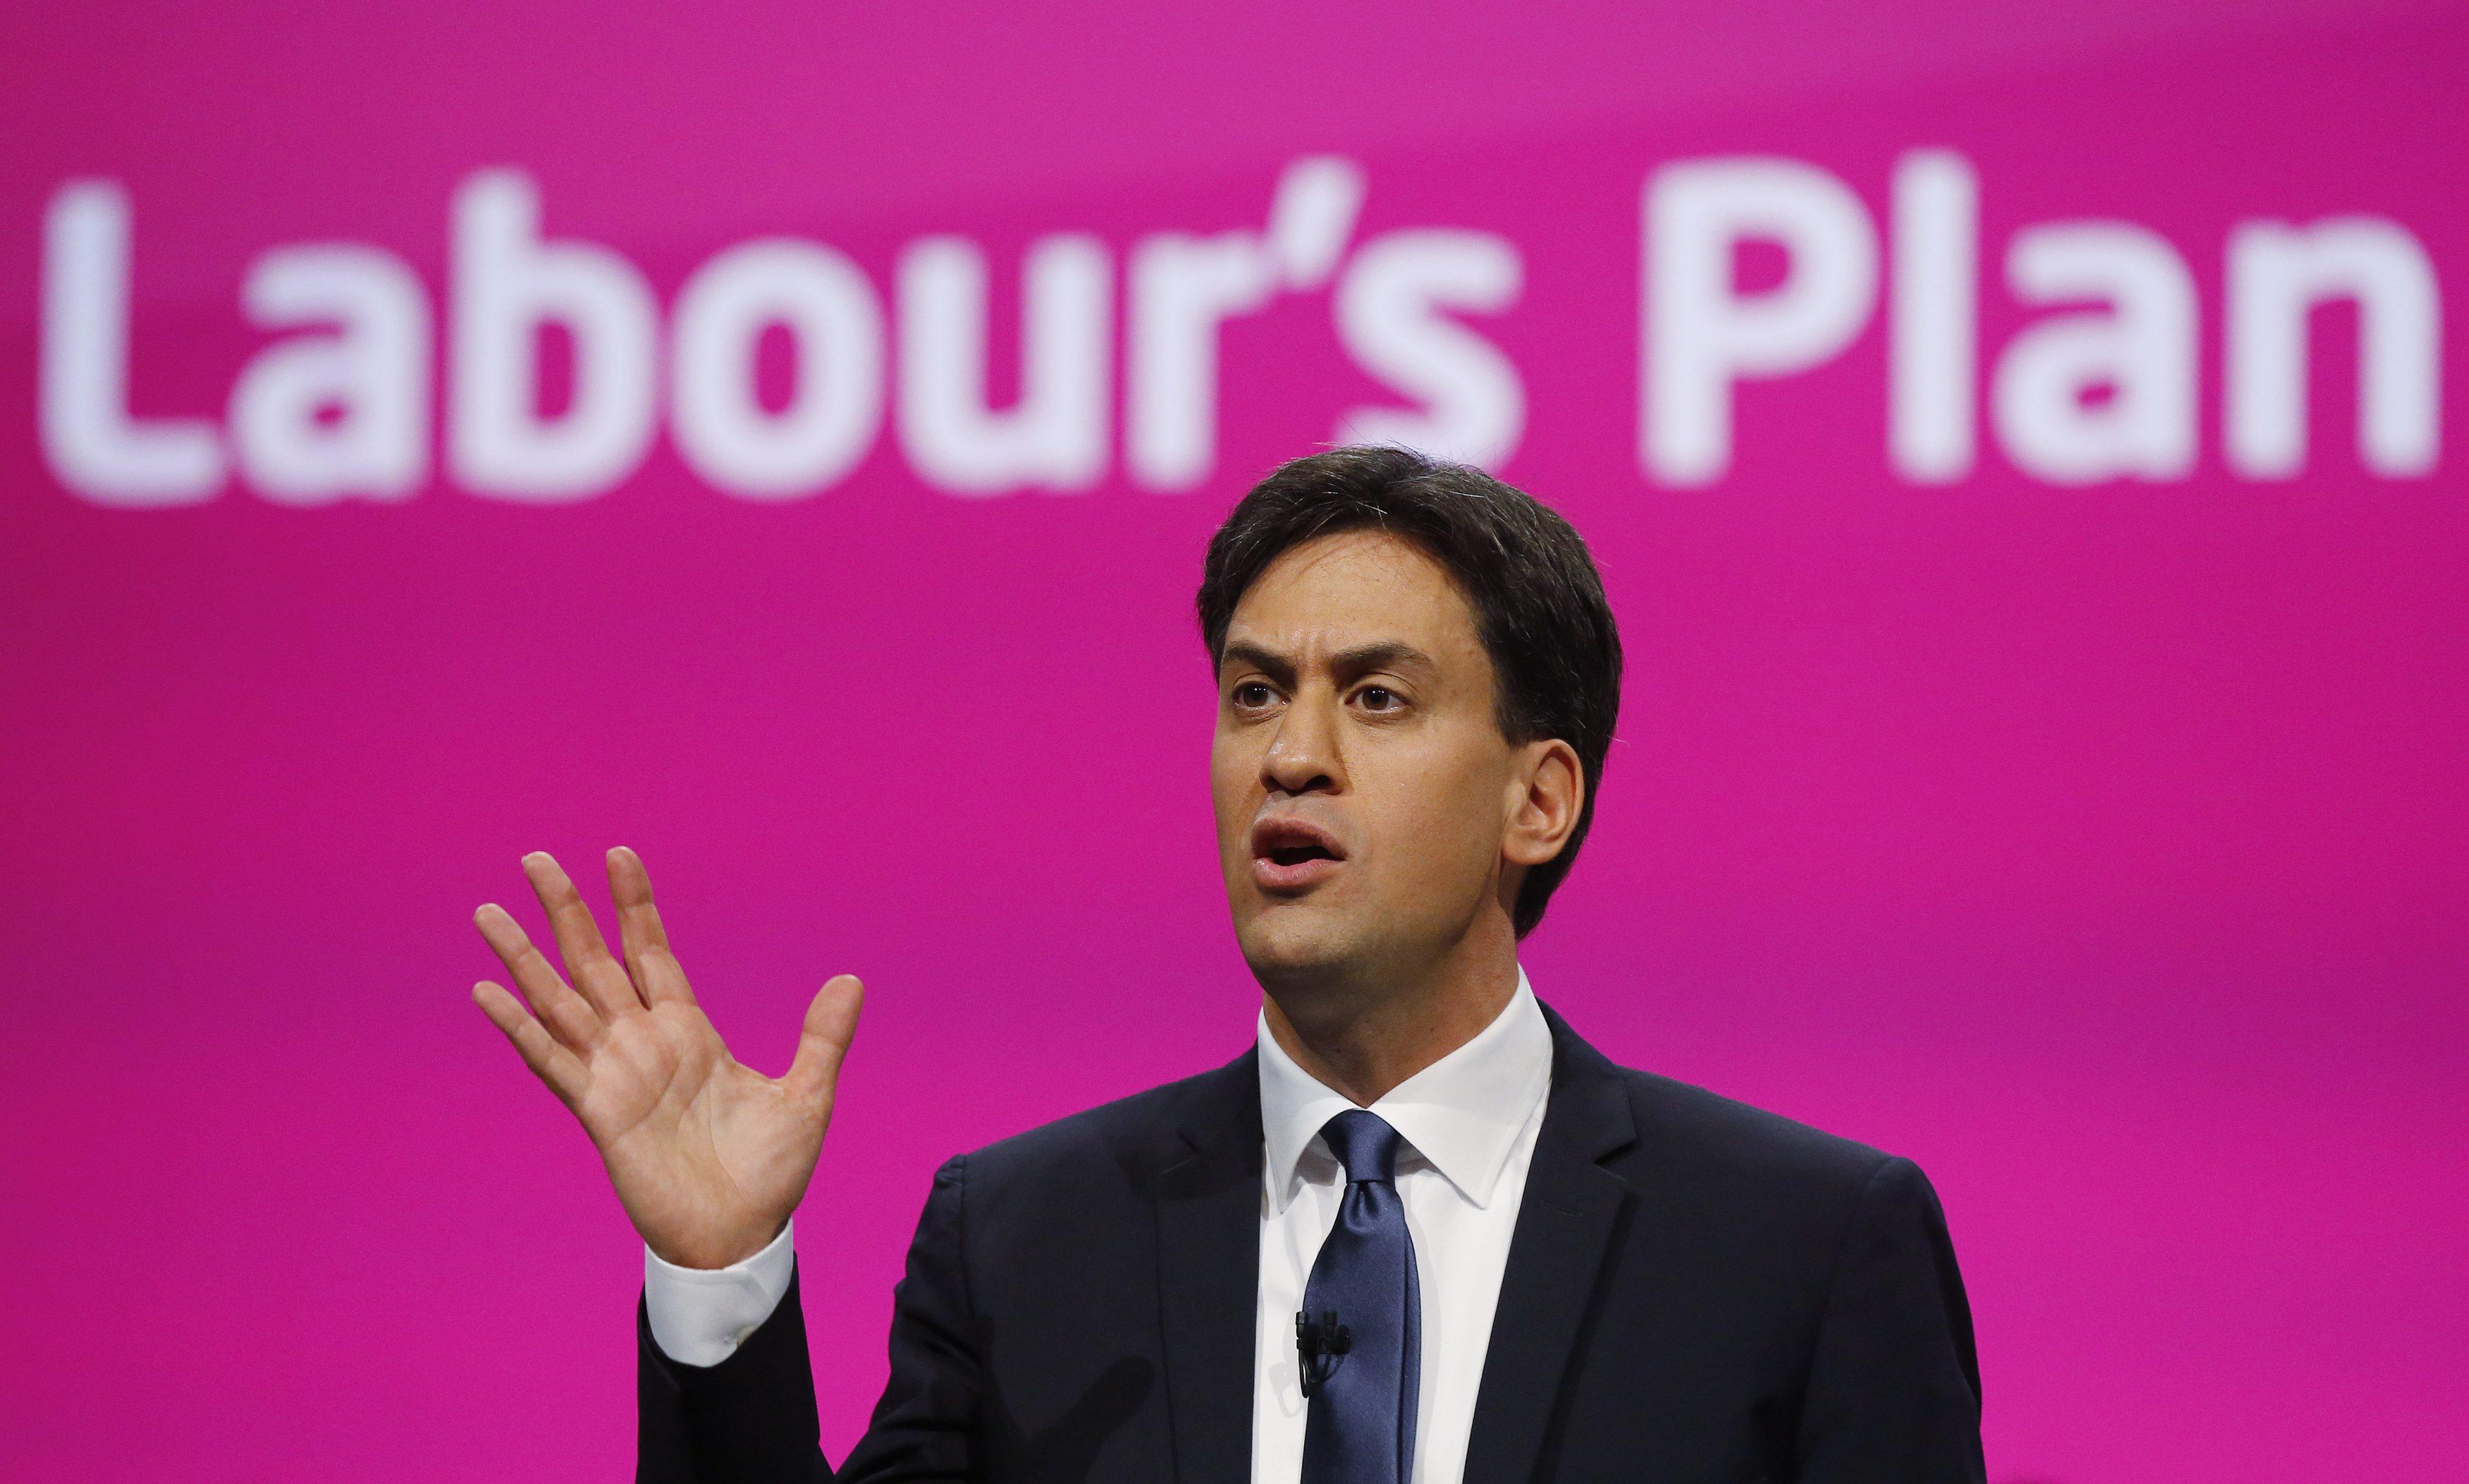 Britain's Labour Leader Confirms He Forgot Vital Parts of Pre-Election Speech